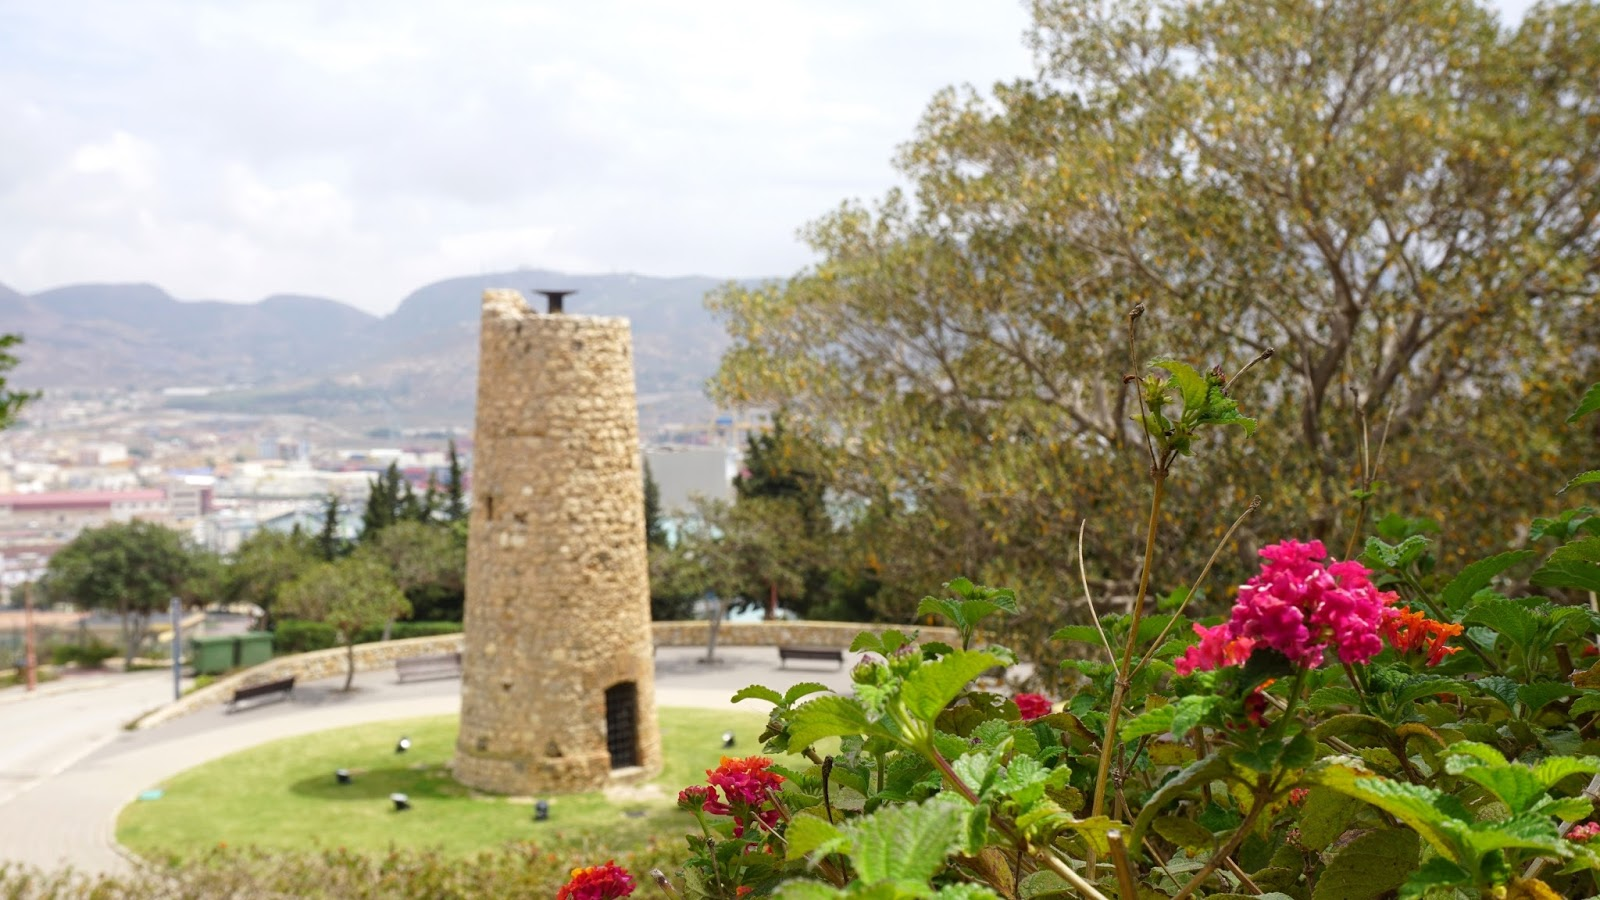 ogród przy Castillo de la Concepcion, Hiszpania, Kartagena, prowincja Murcja,  Costa Calida